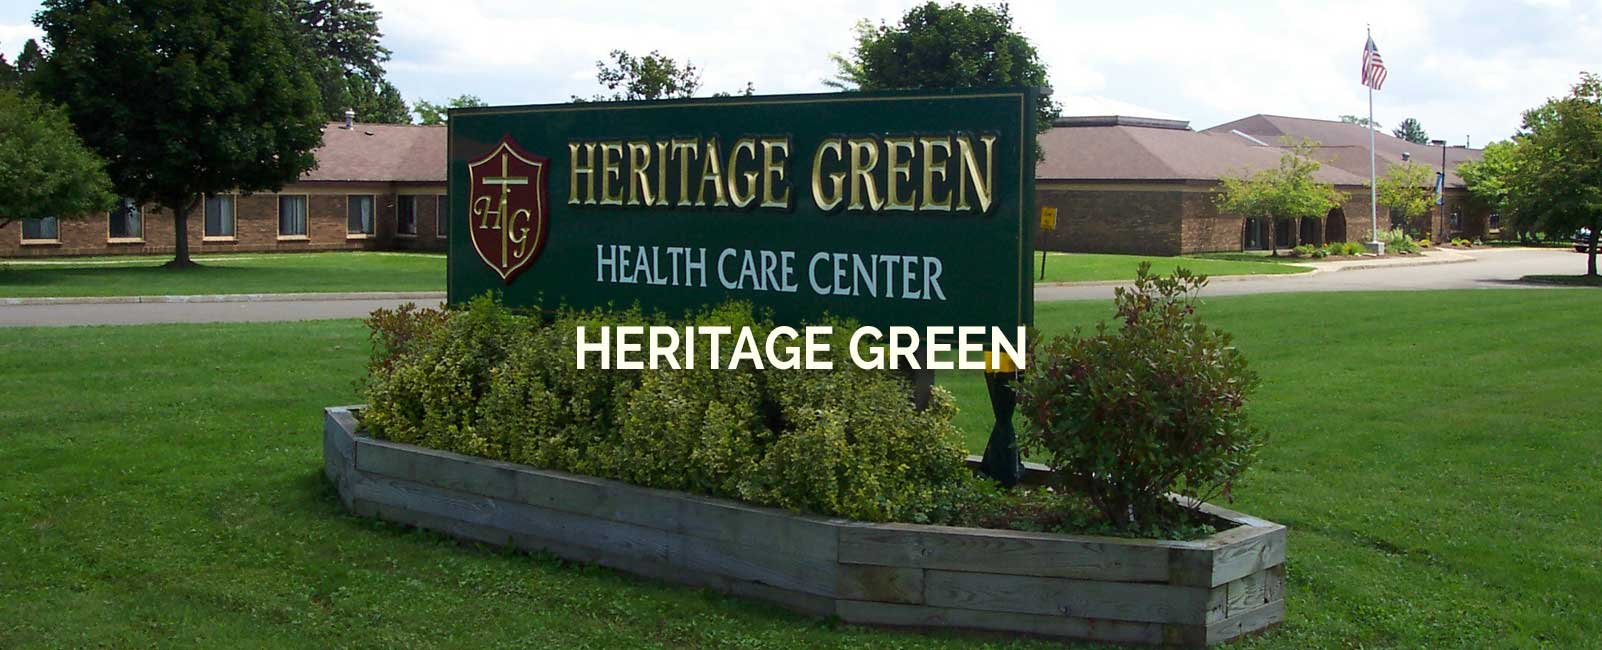 heritage-green-healthcare-center-seniors-western-new-york